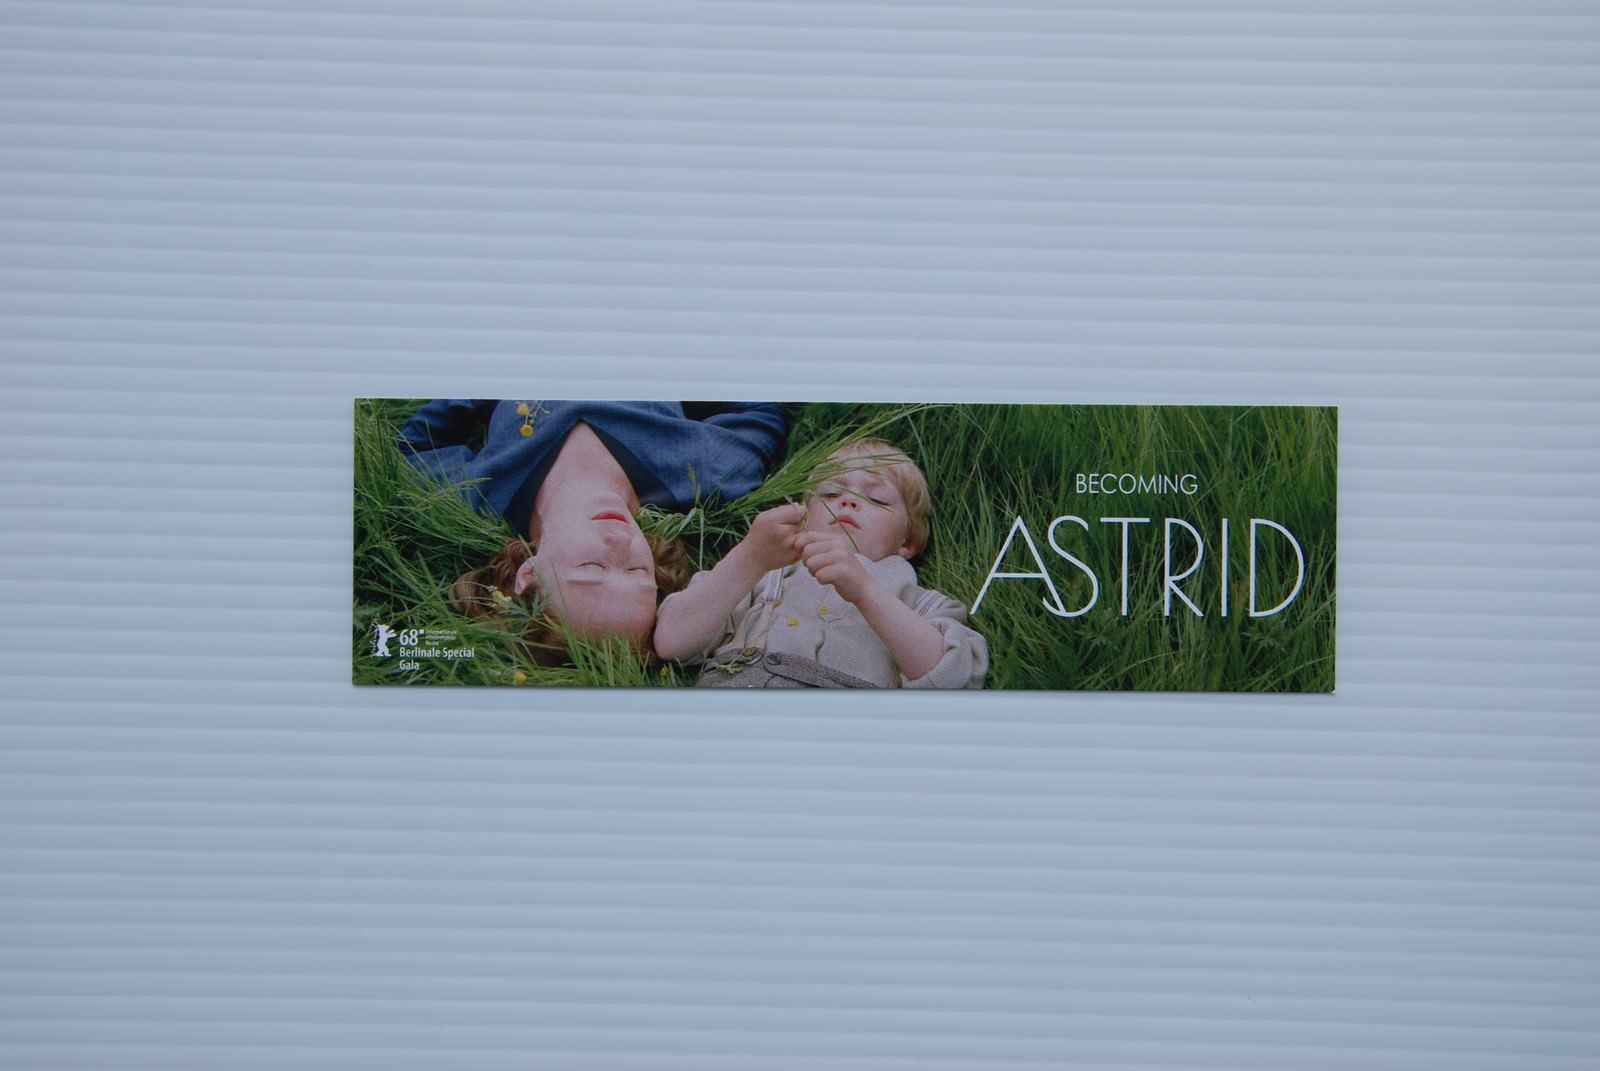 Movie, Unga Astrid(瑞典, 2018年) / 當幸福提早來(台灣) / Becoming Astrid(英文) / 关于阿斯特丽德(網路), 電影票(特映會)